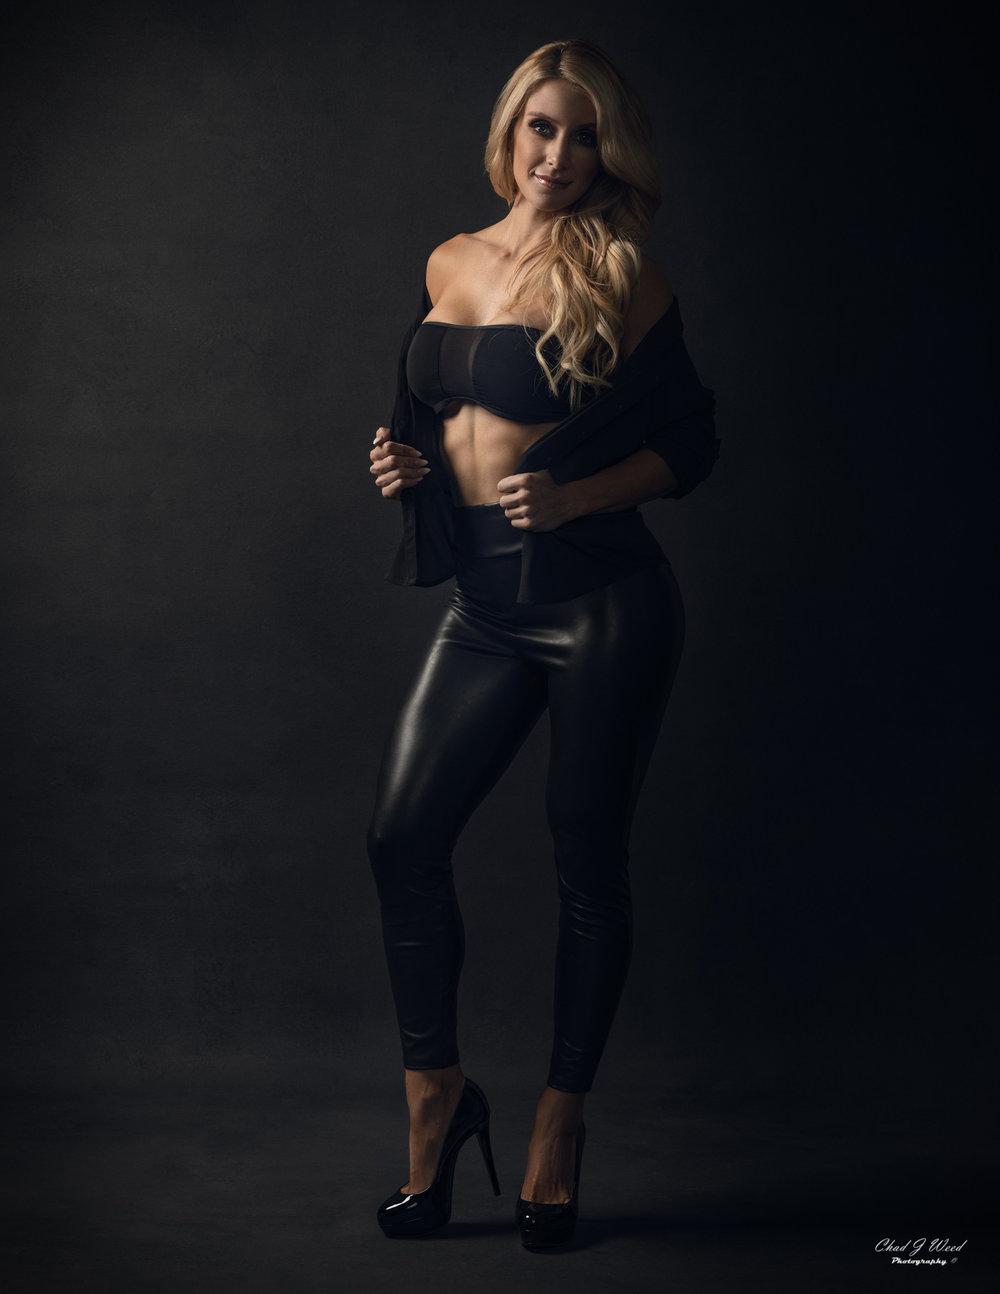 Mesa Arizona Fashion Photographer Chad Weed with Fashion Model Kristi - 1